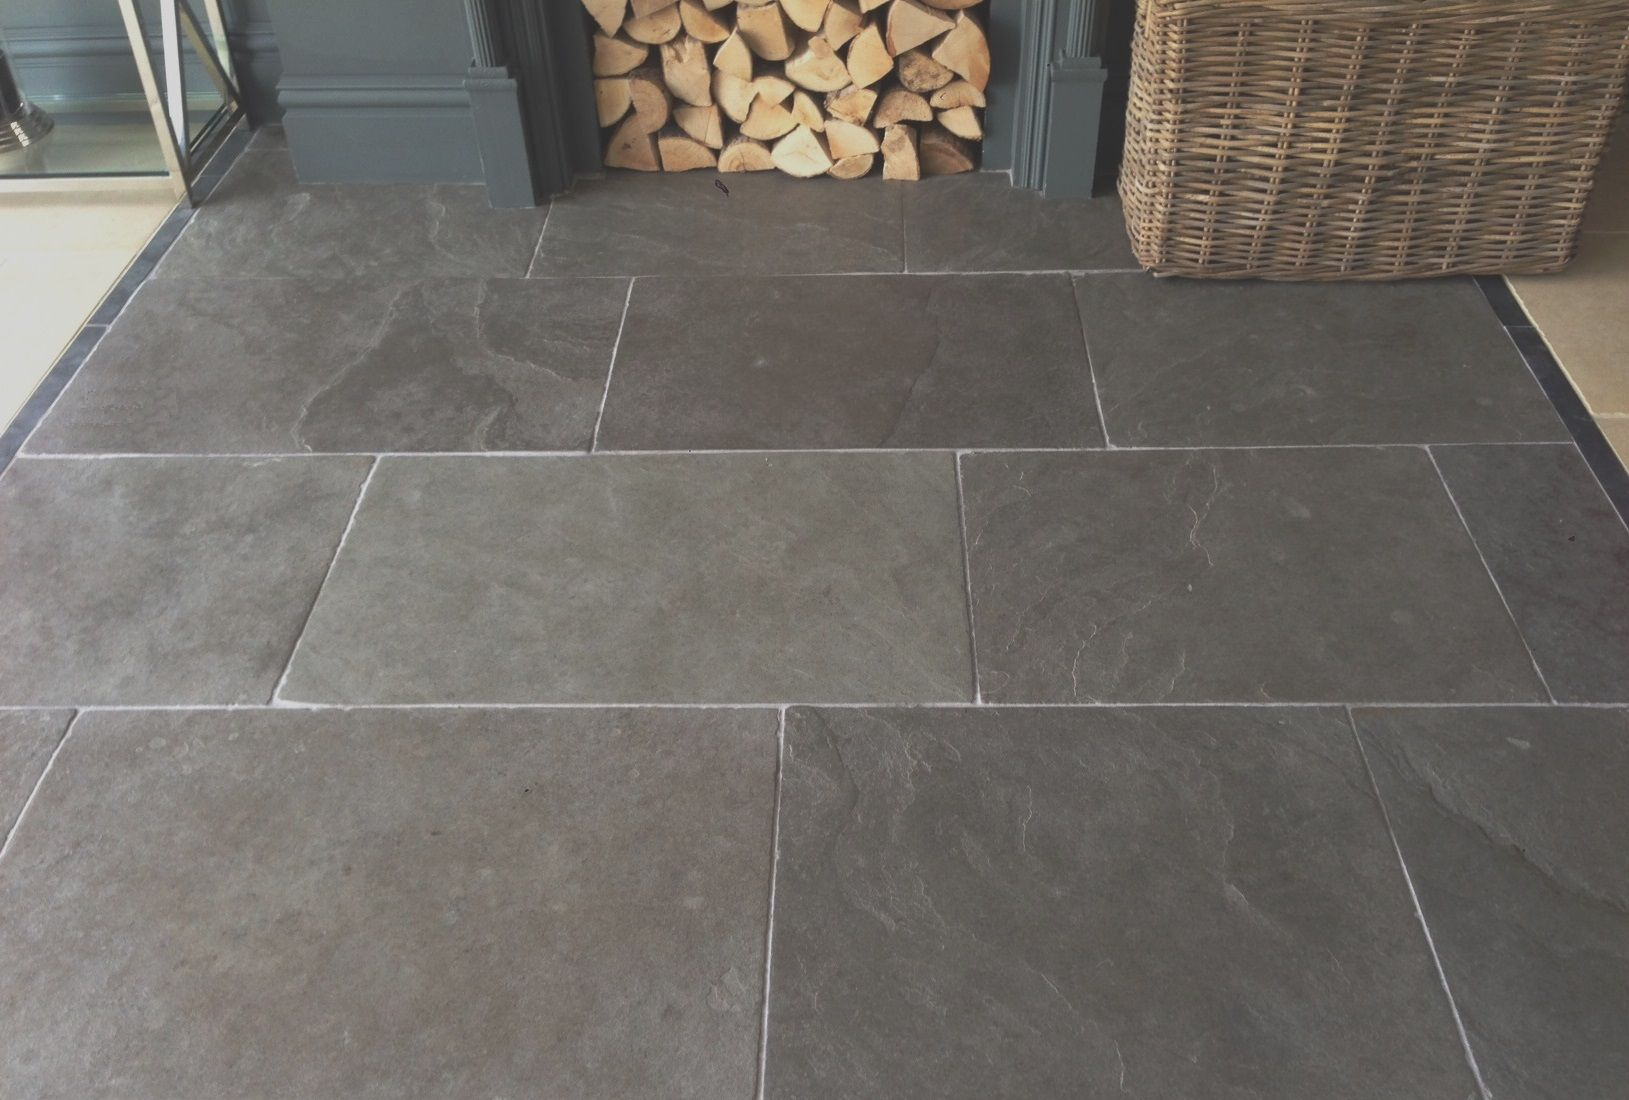 Rustic And Warm Ashton Grey Limestone Flagstones Are